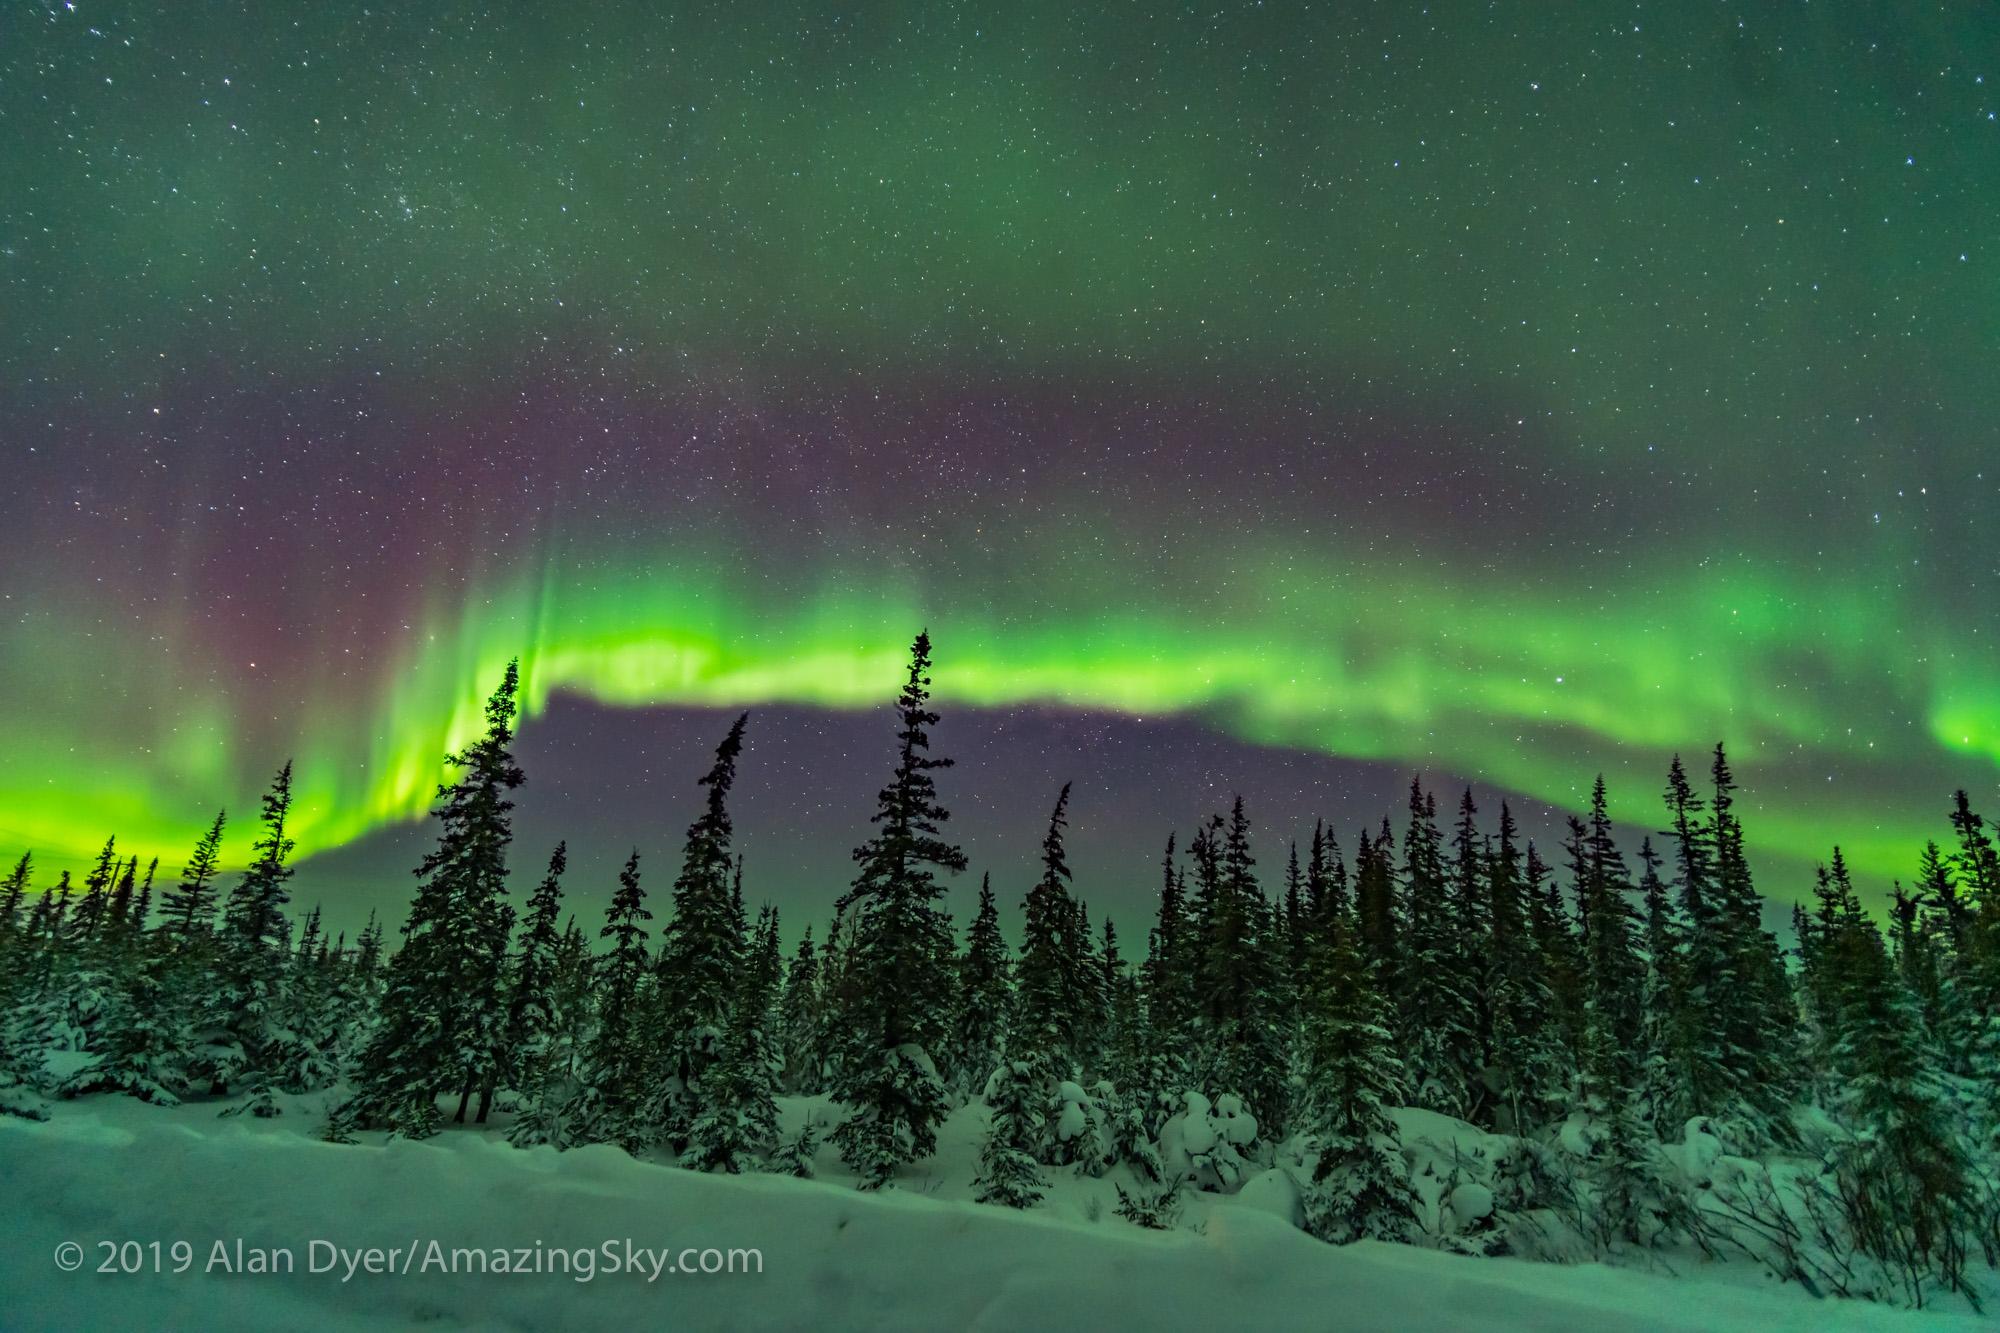 Aurora over Snowy Trees (Feb 9, 2019)